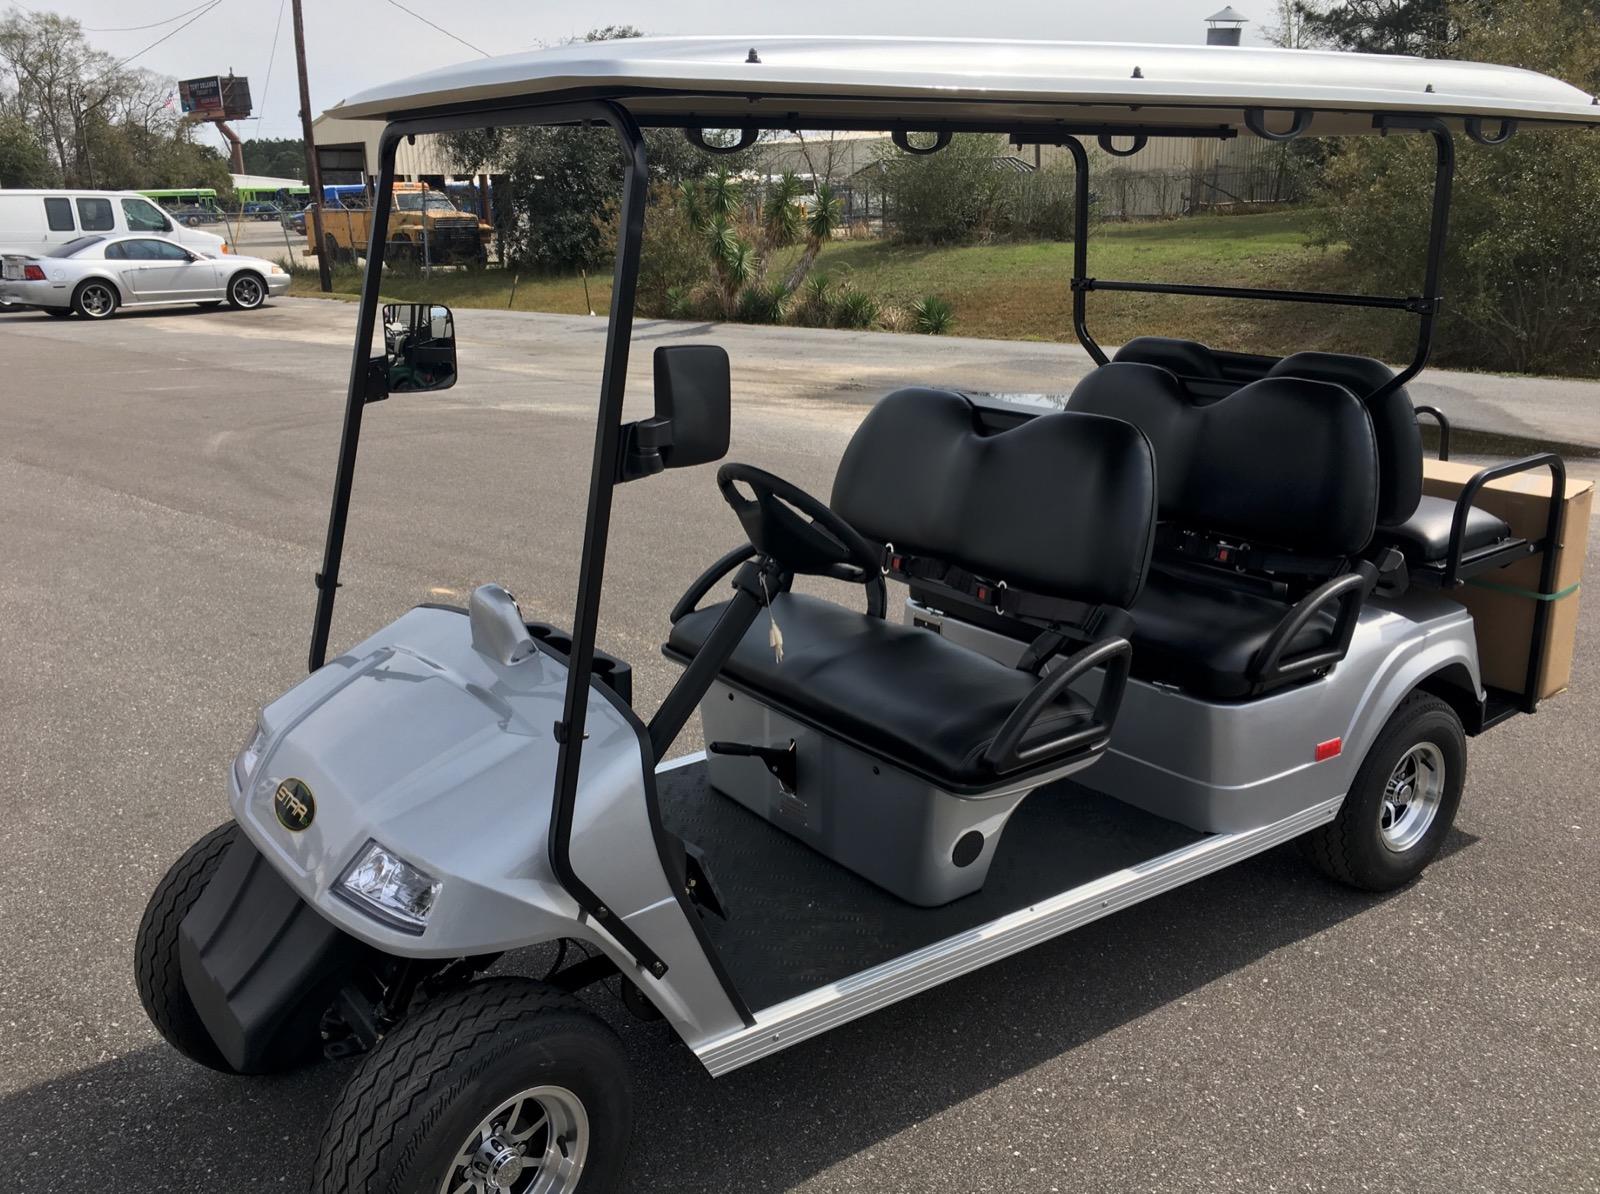 Street Legal Golf Carts 19